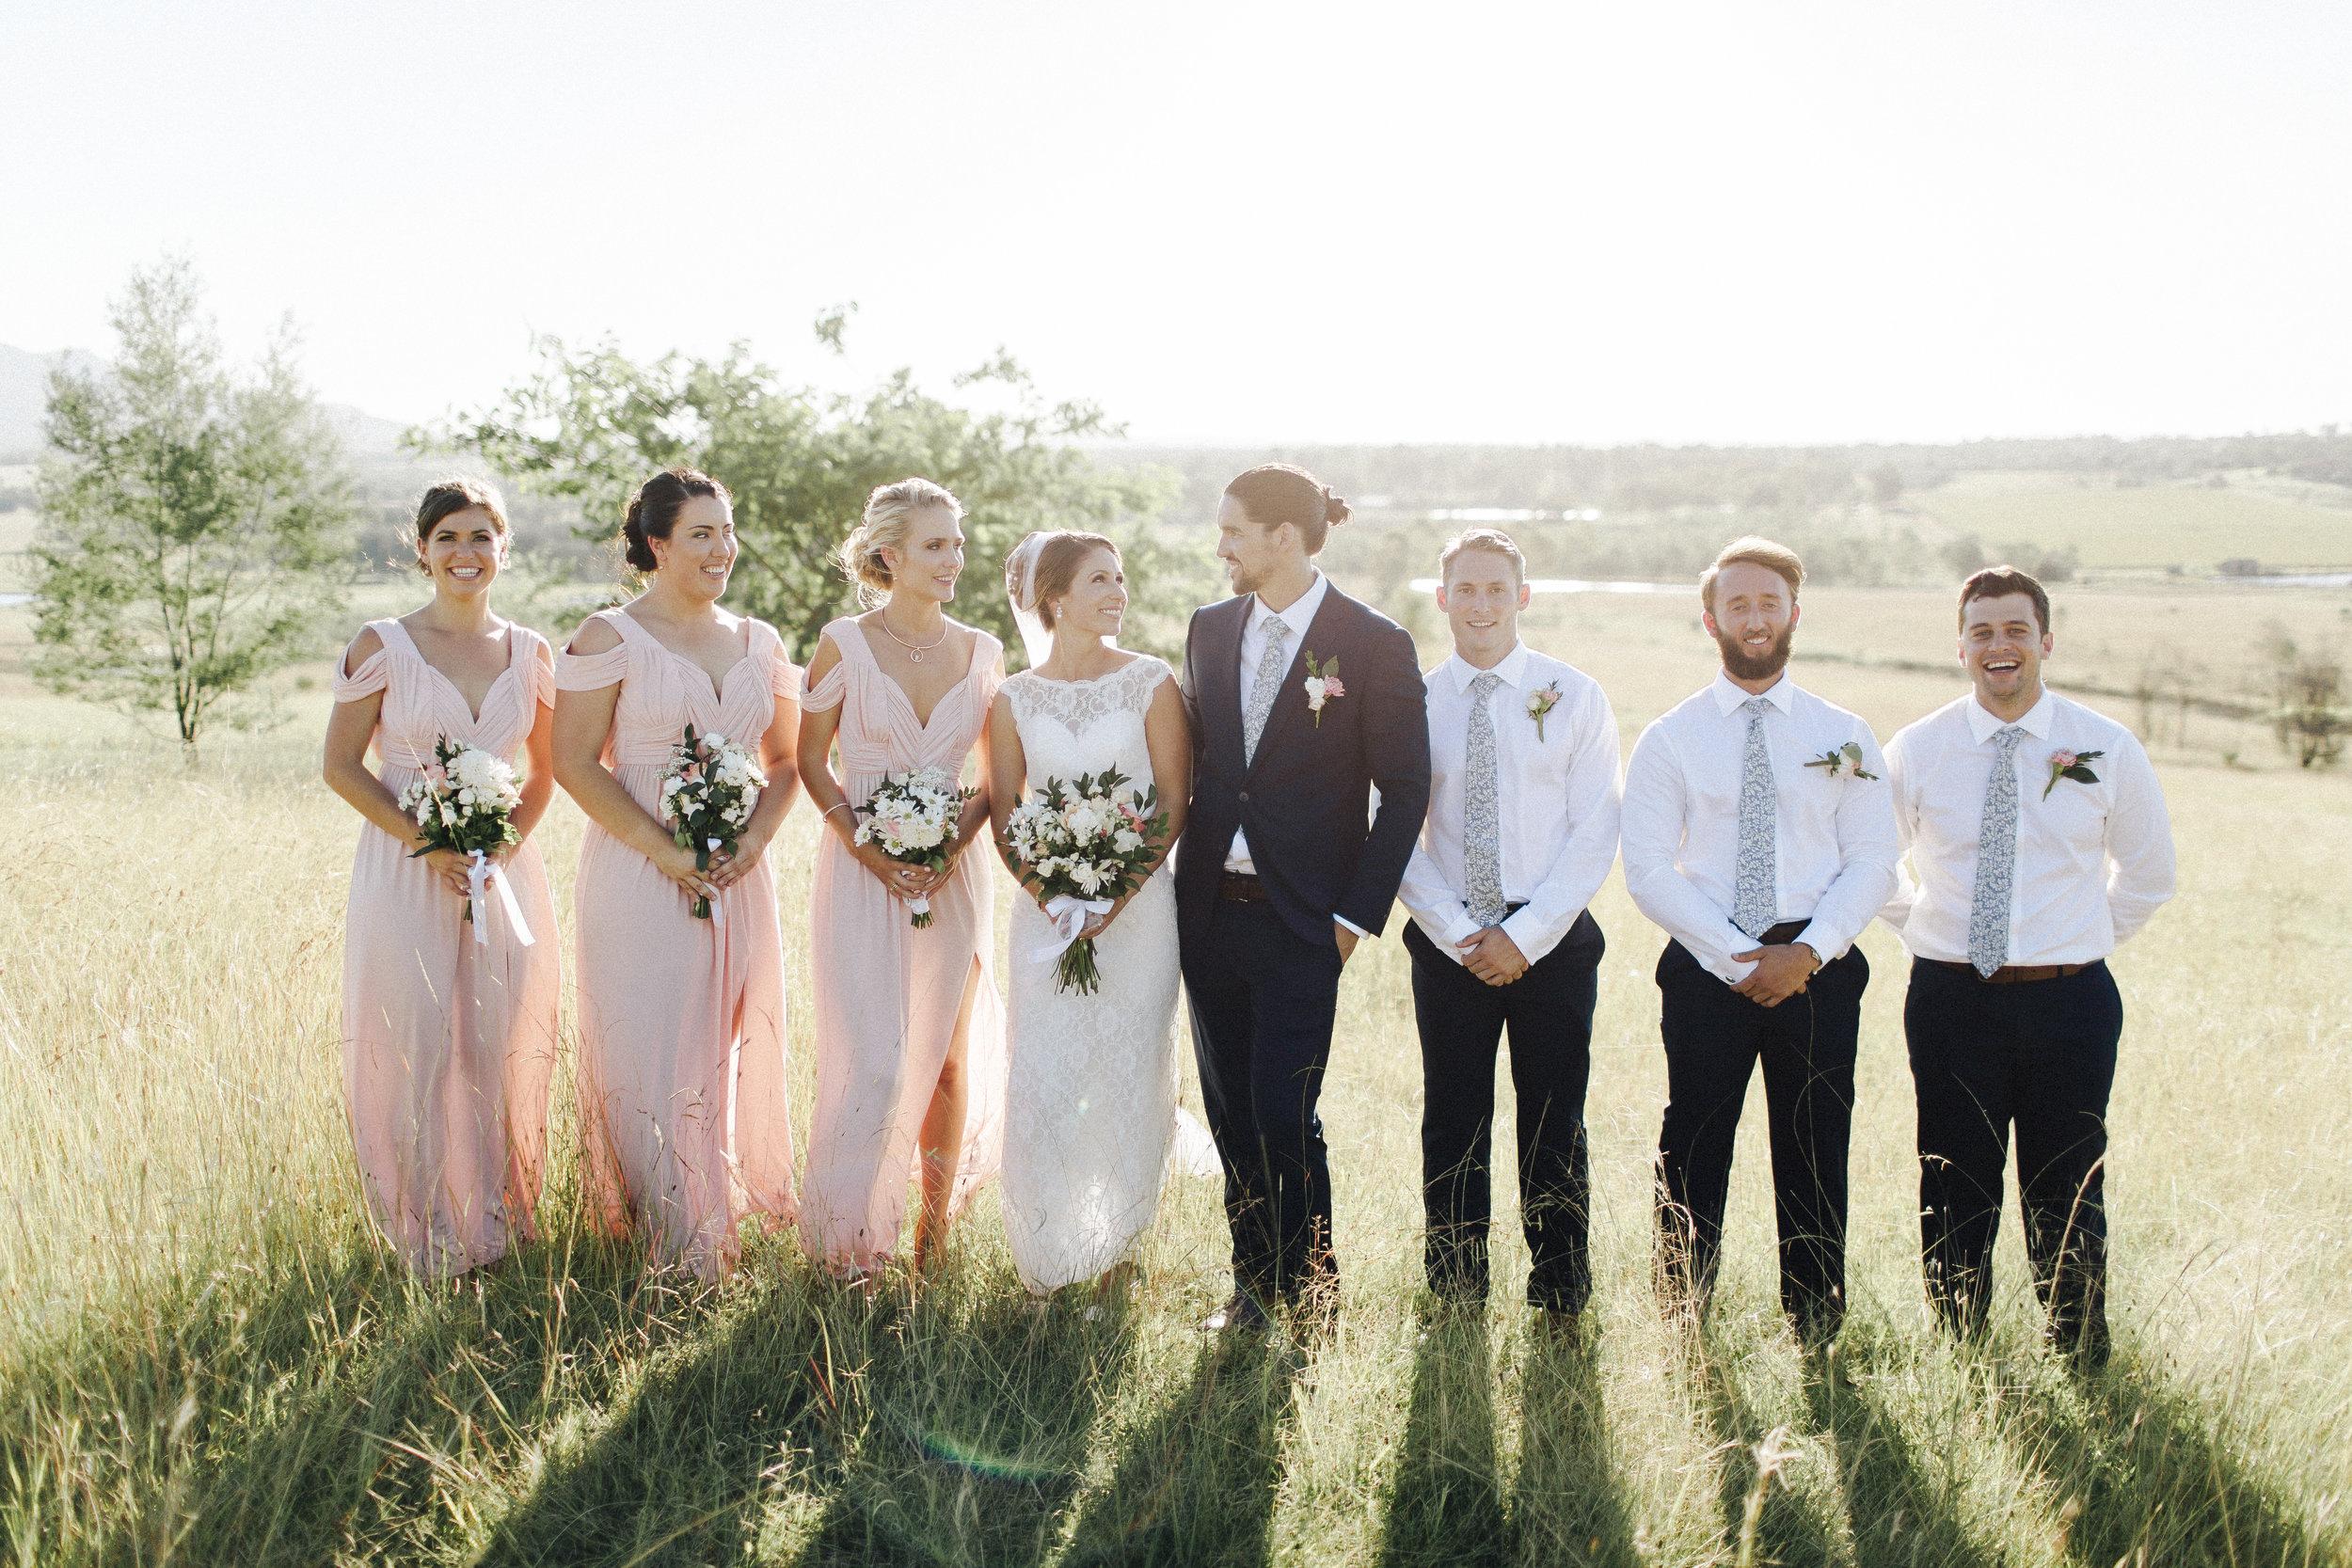 WeddingPhotos_HighResolution-1344.jpg